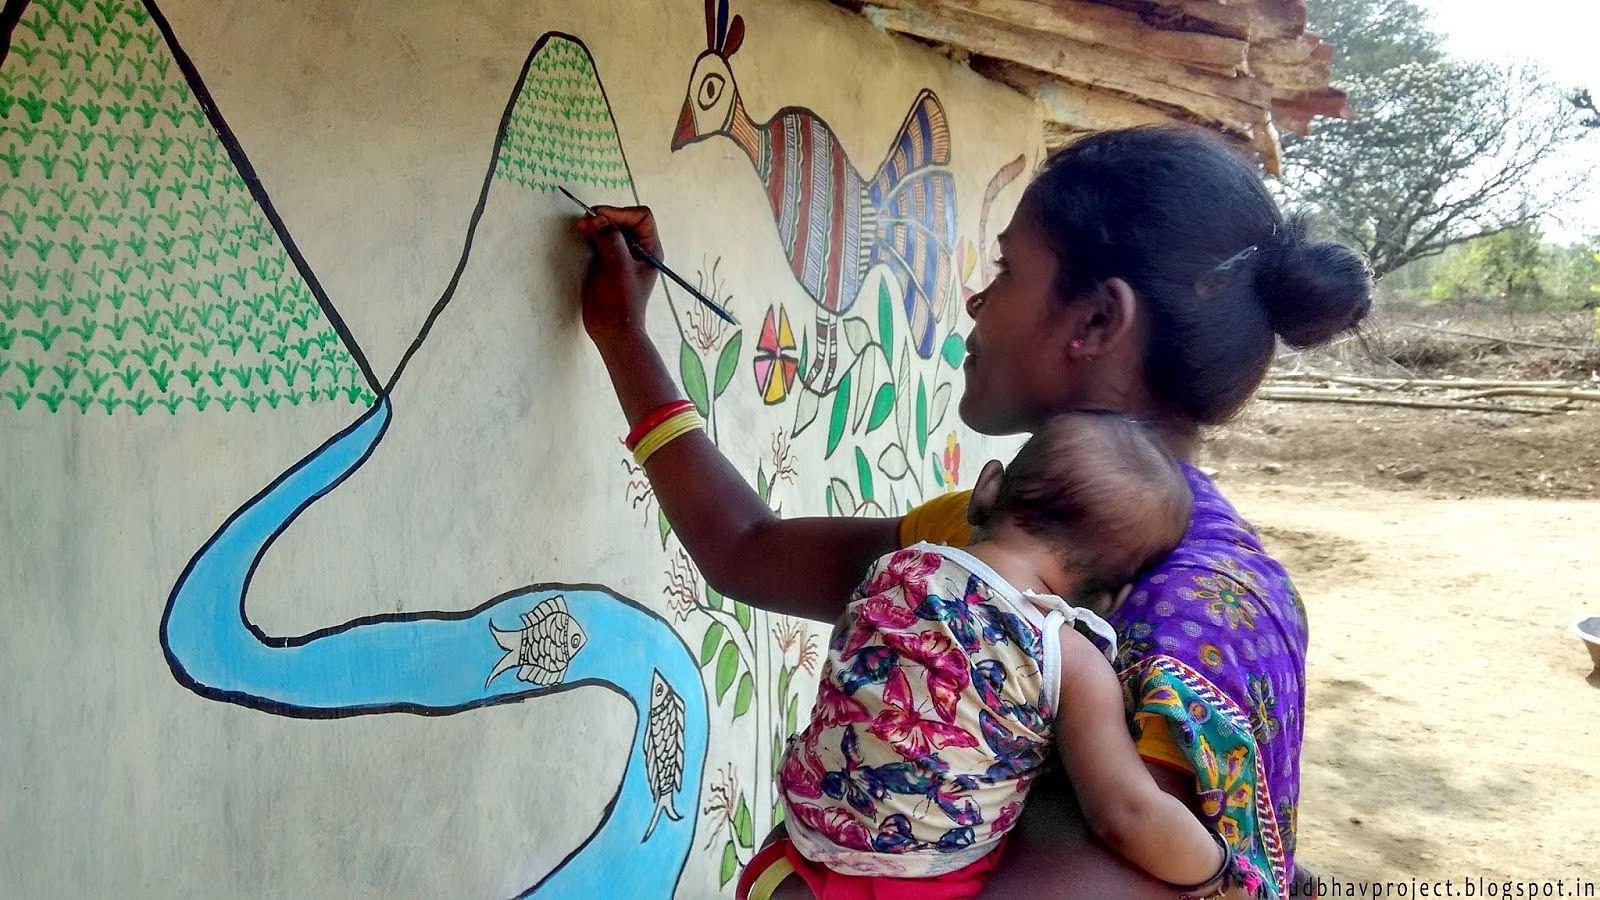 Artist Avinash karn Artreach Udbhav Sunita Devi india